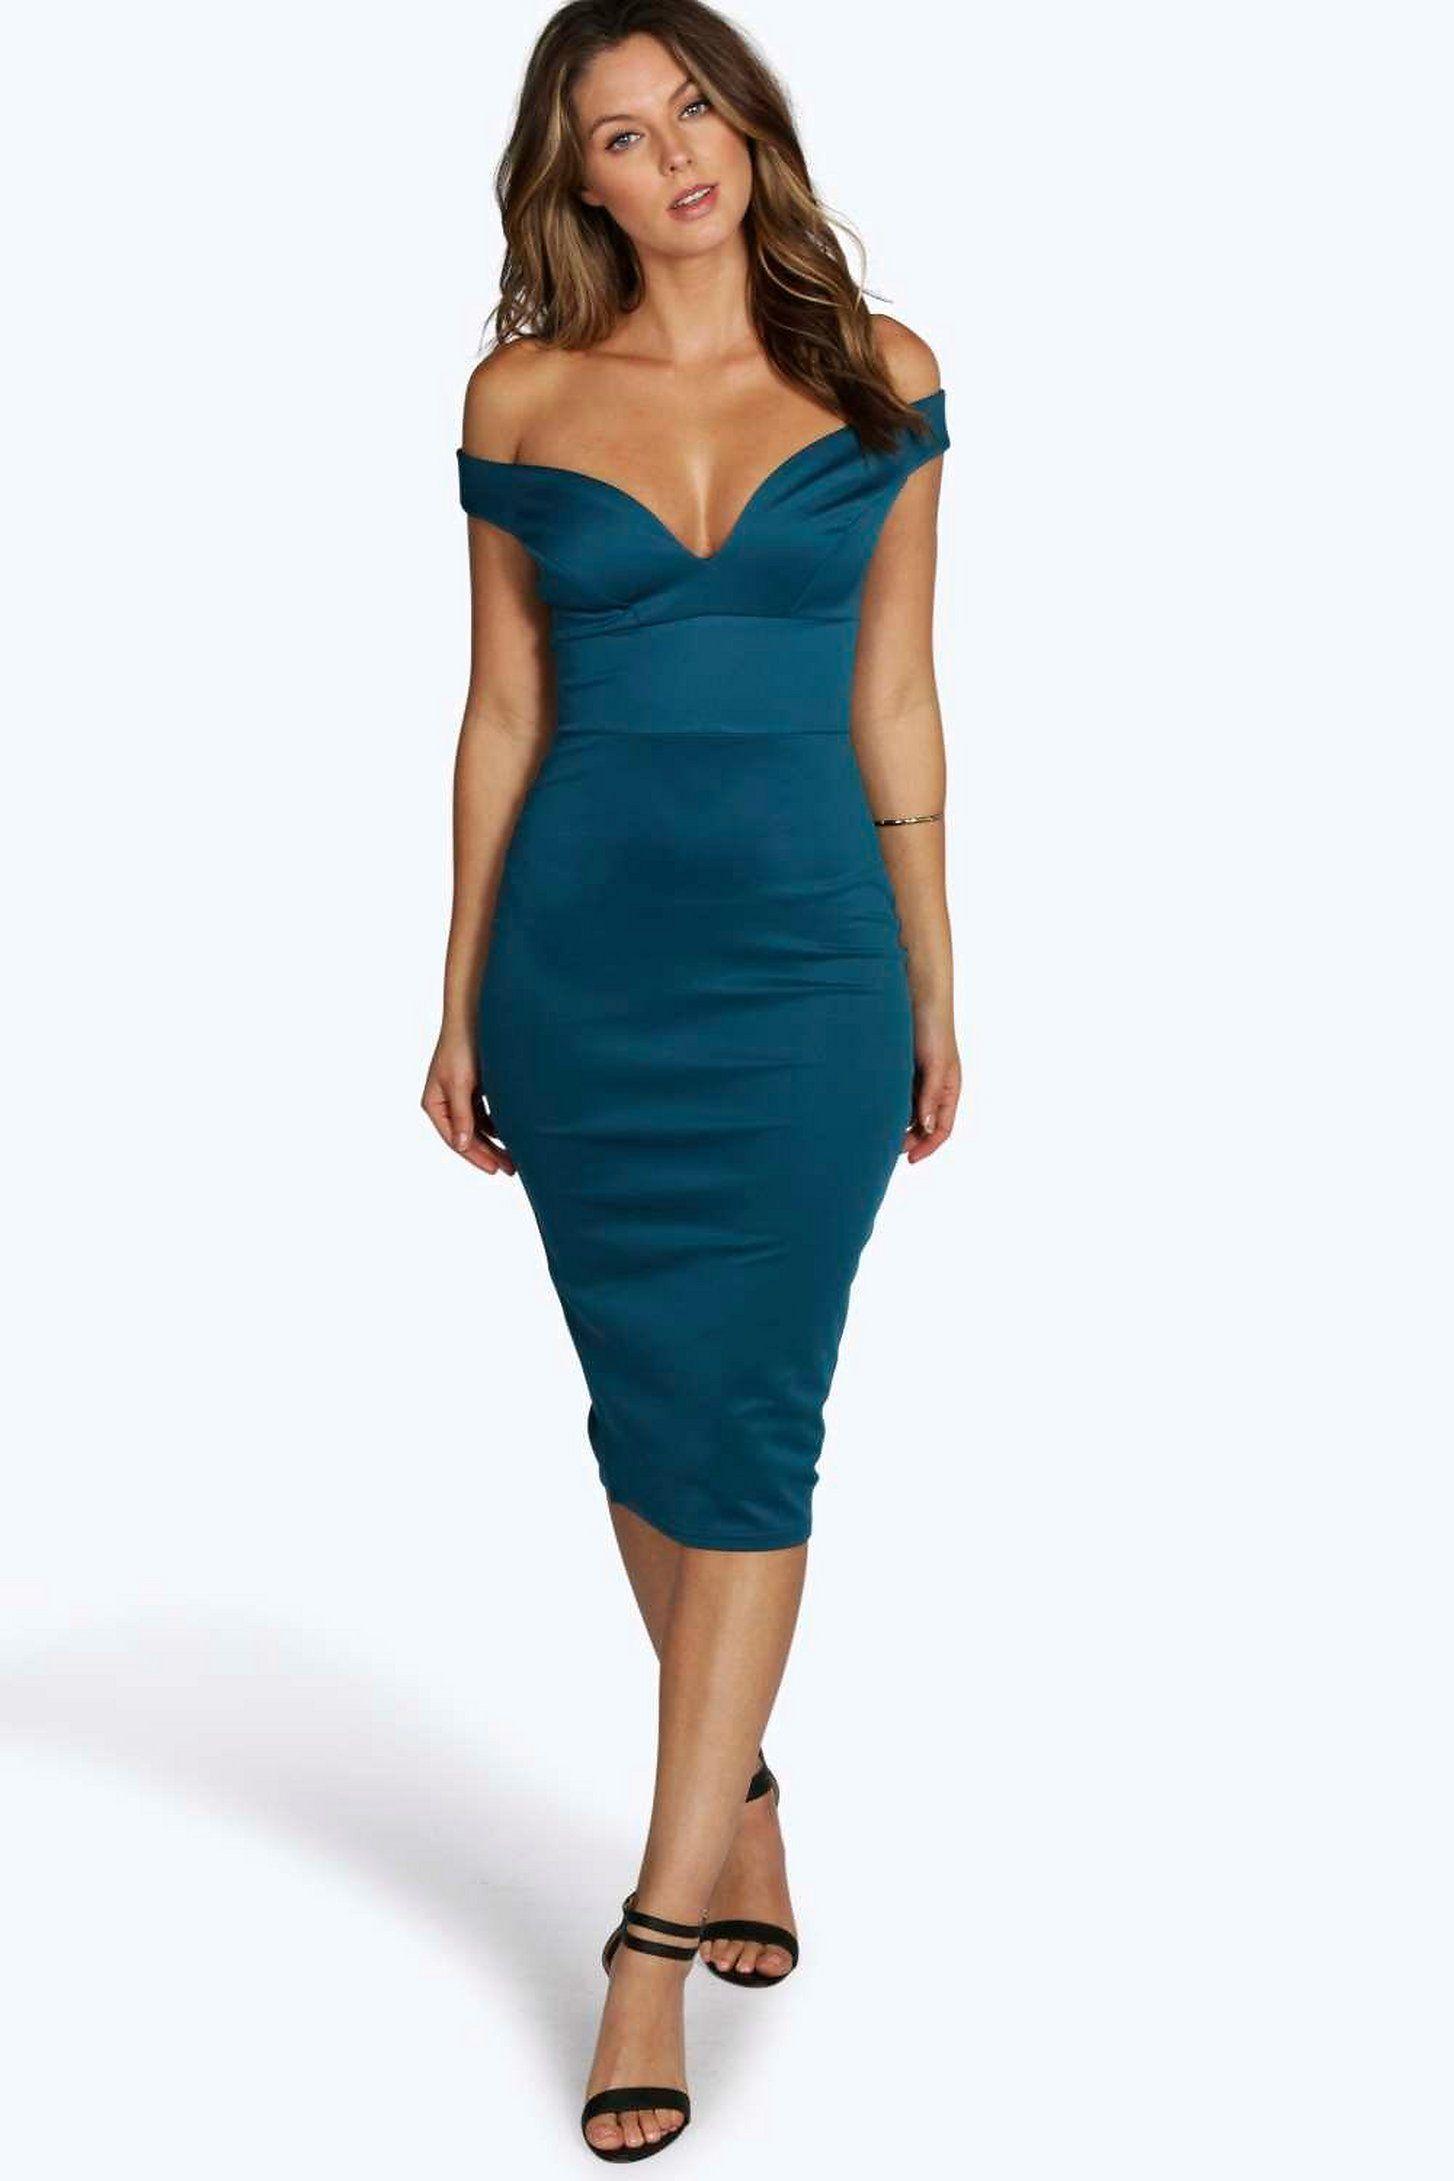 Sweetheart Off Shoulder Bodycon Midi Dress Boohoo Midi Dress Bodycon Bodycon Dress Dresses For Tweens [ 2181 x 1454 Pixel ]